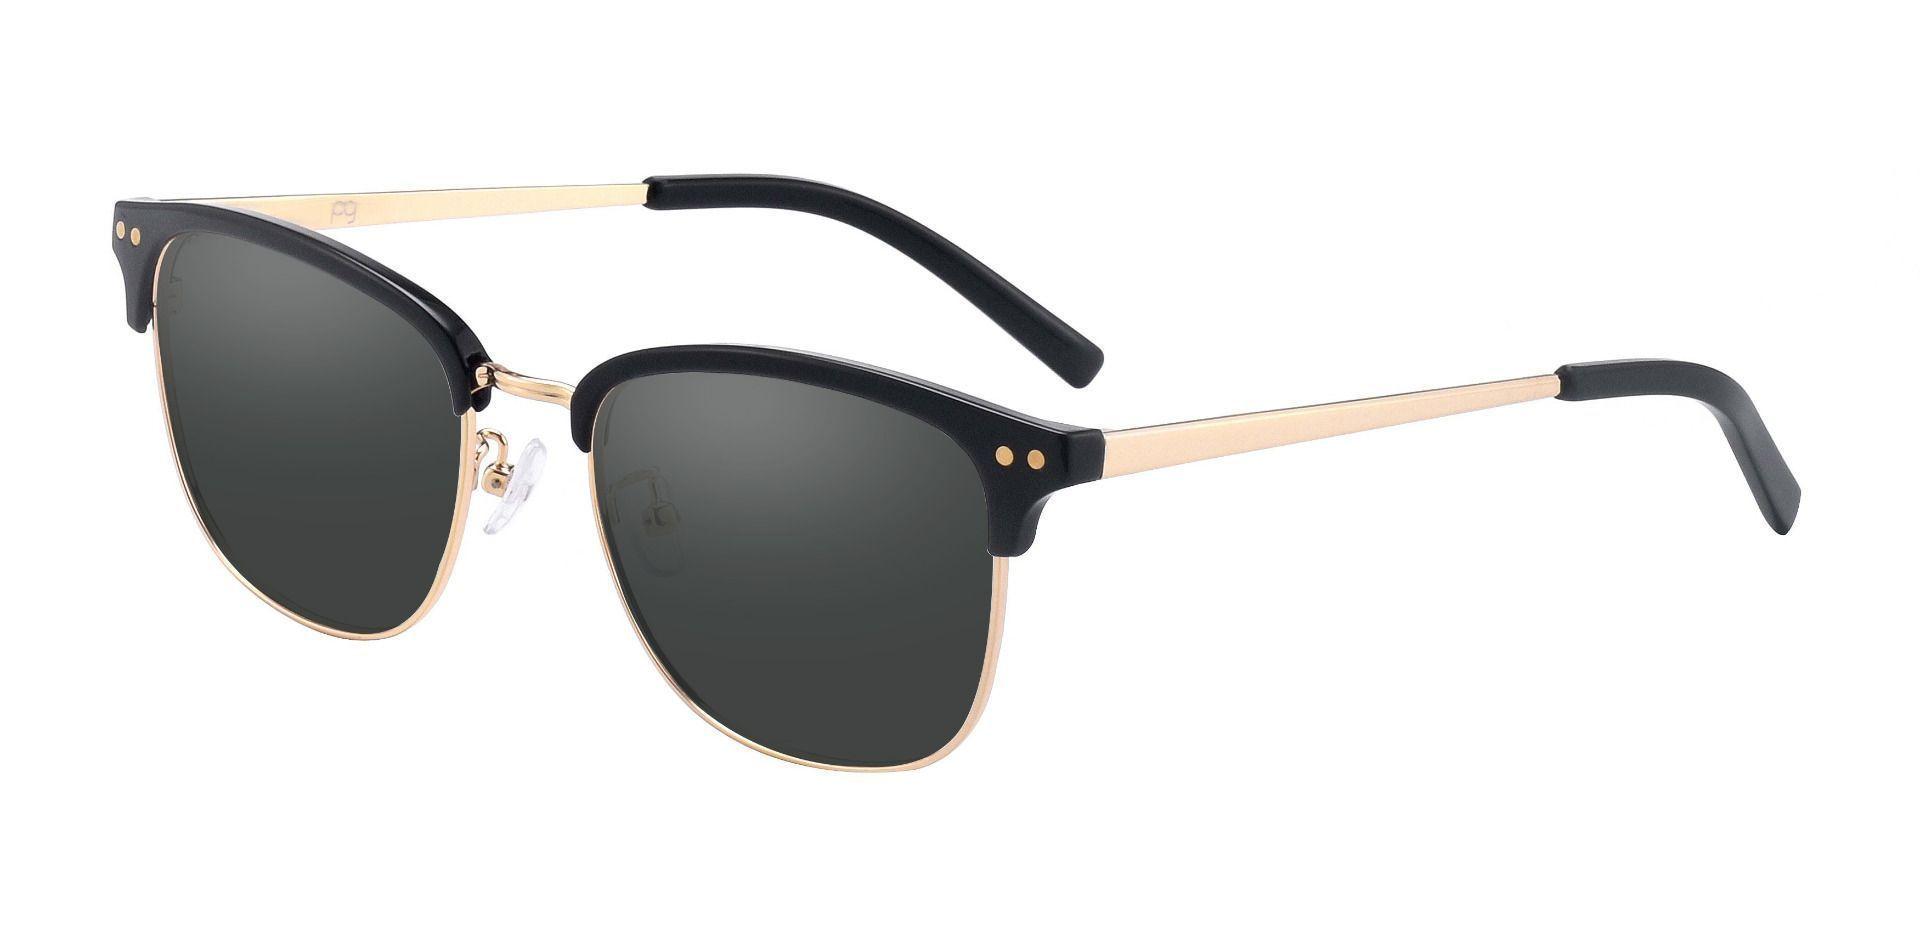 Cutler Browline Prescription Sunglasses - Black Frame With Gray Lenses